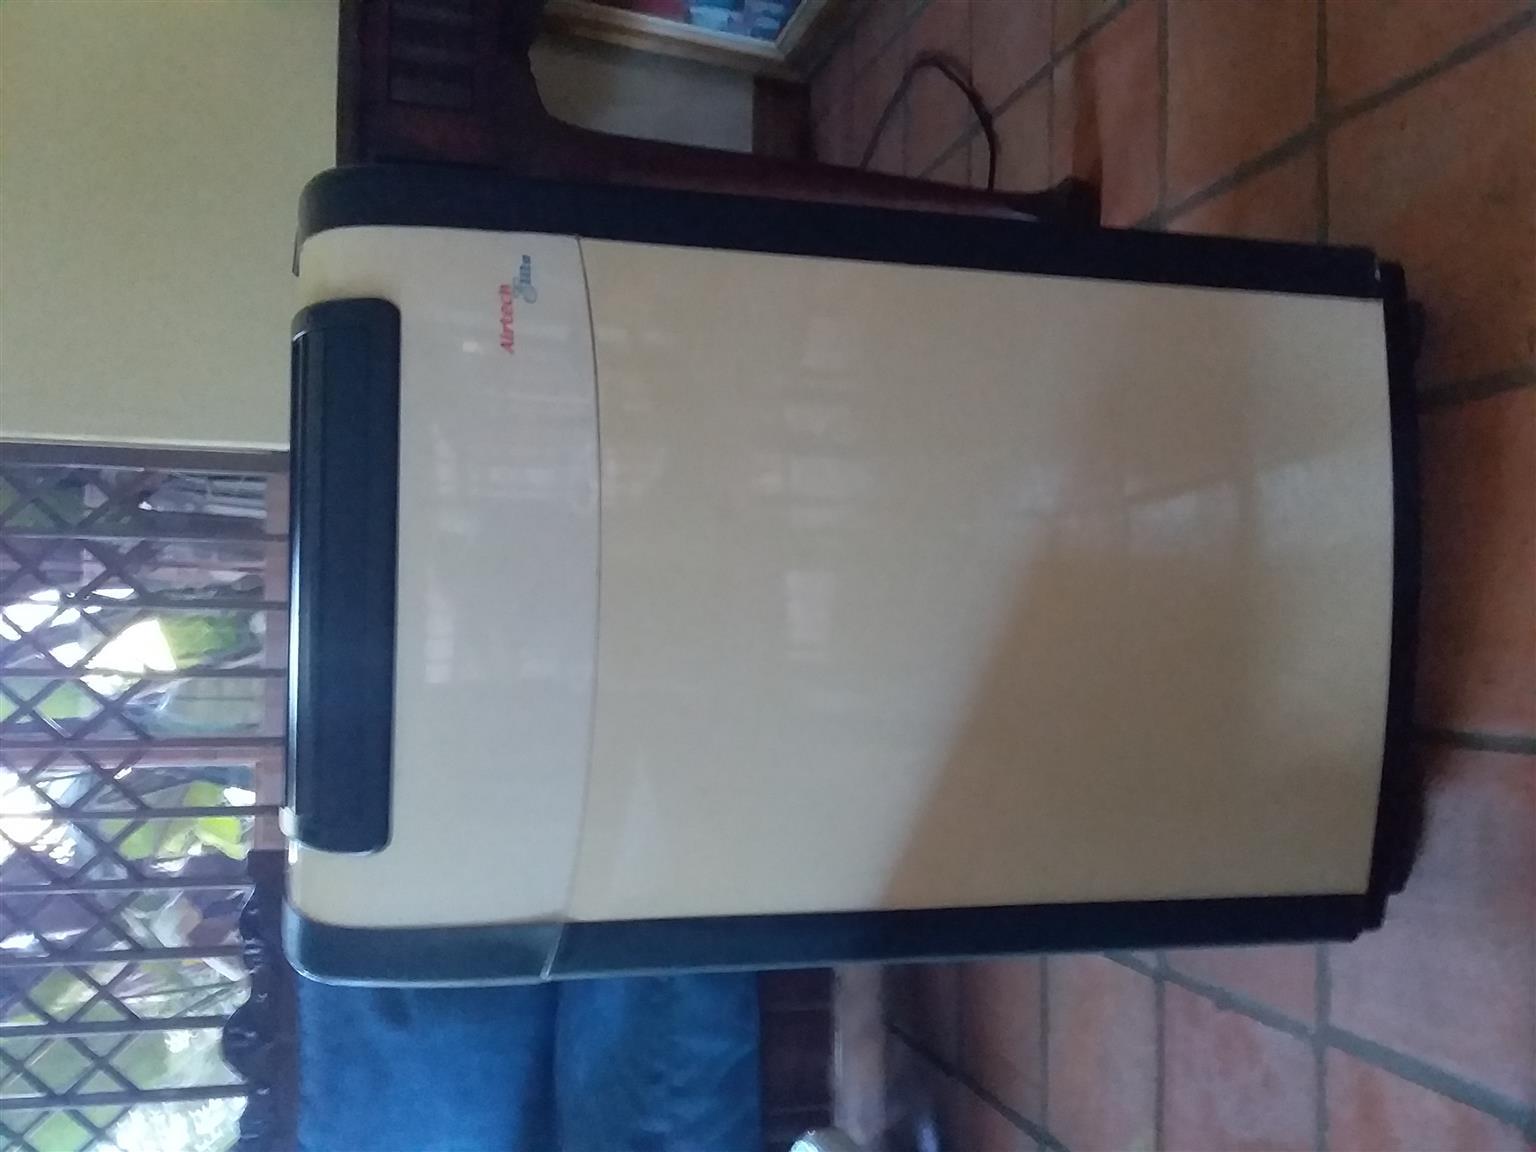 Airtech Elite - Portable air conditioner